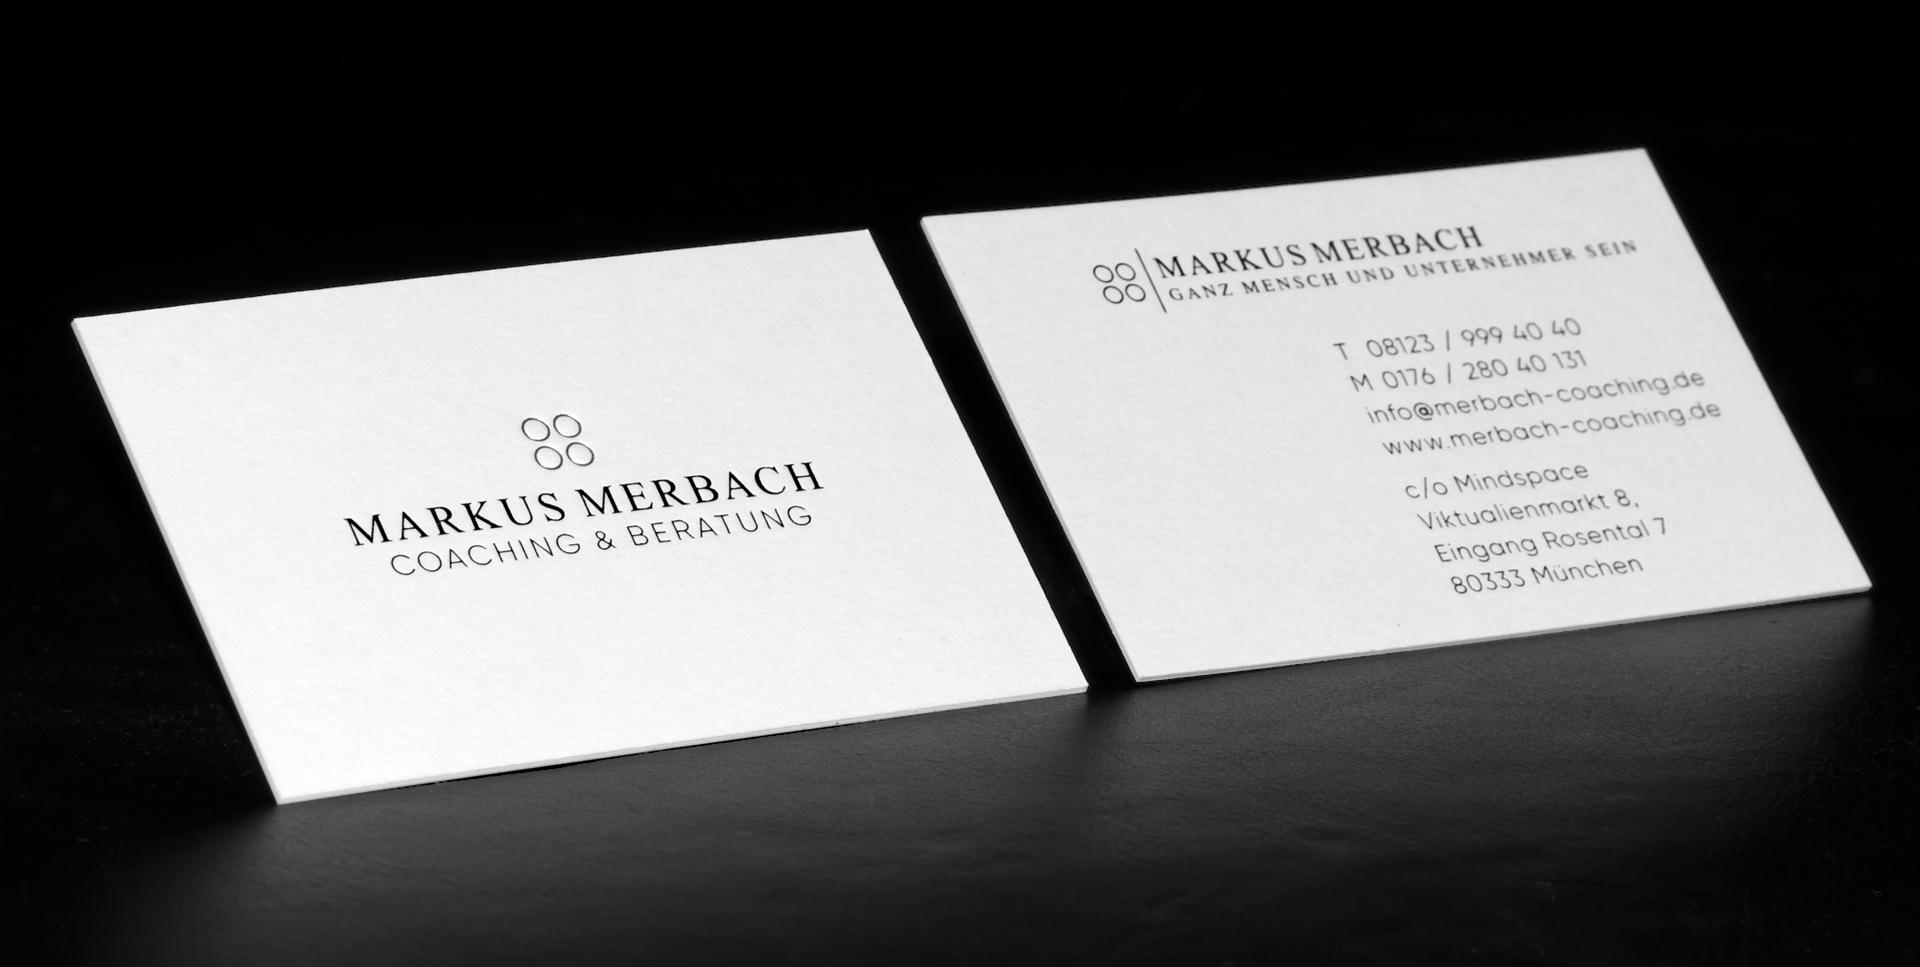 STUDIO-MUNIQUE-MARKUS-MERBACH-VISITENKARTE